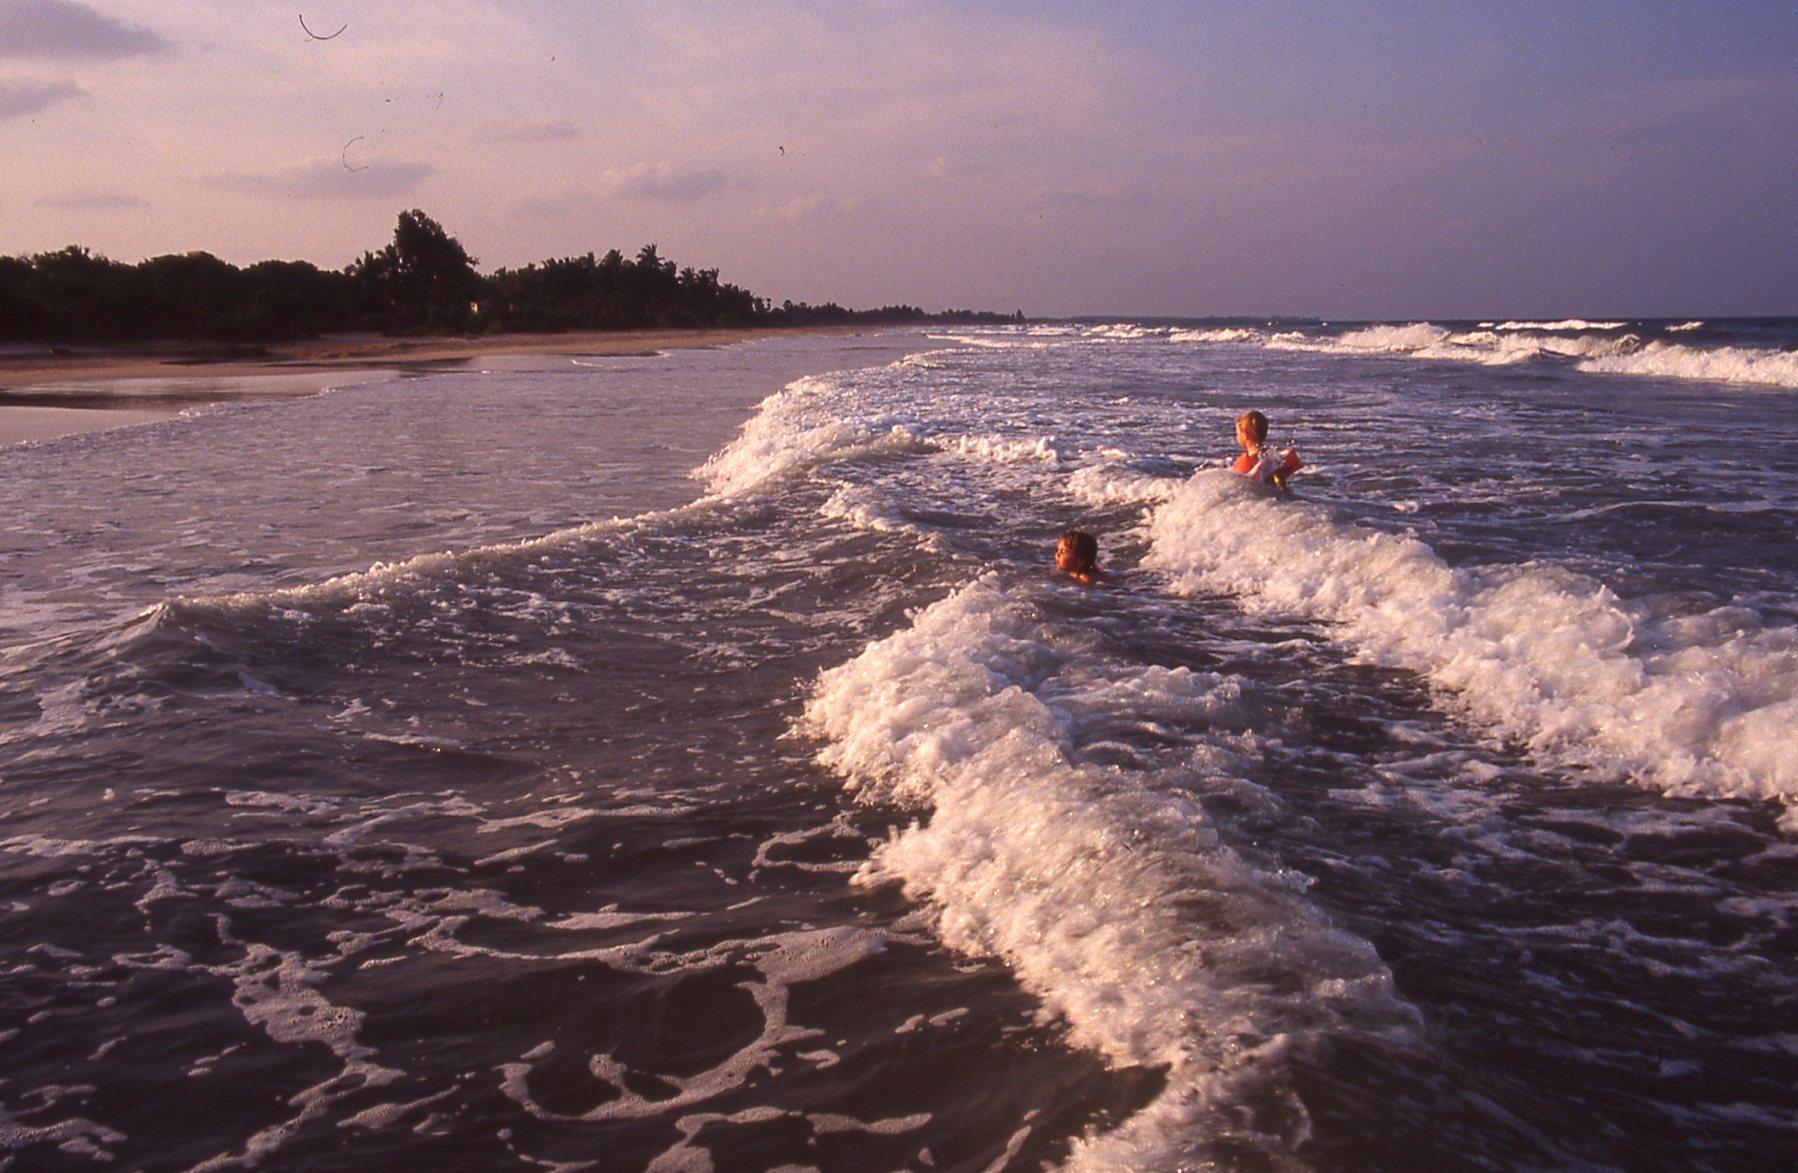 Sri lanka North Coast surf watch © JonoVernon-Powell.com